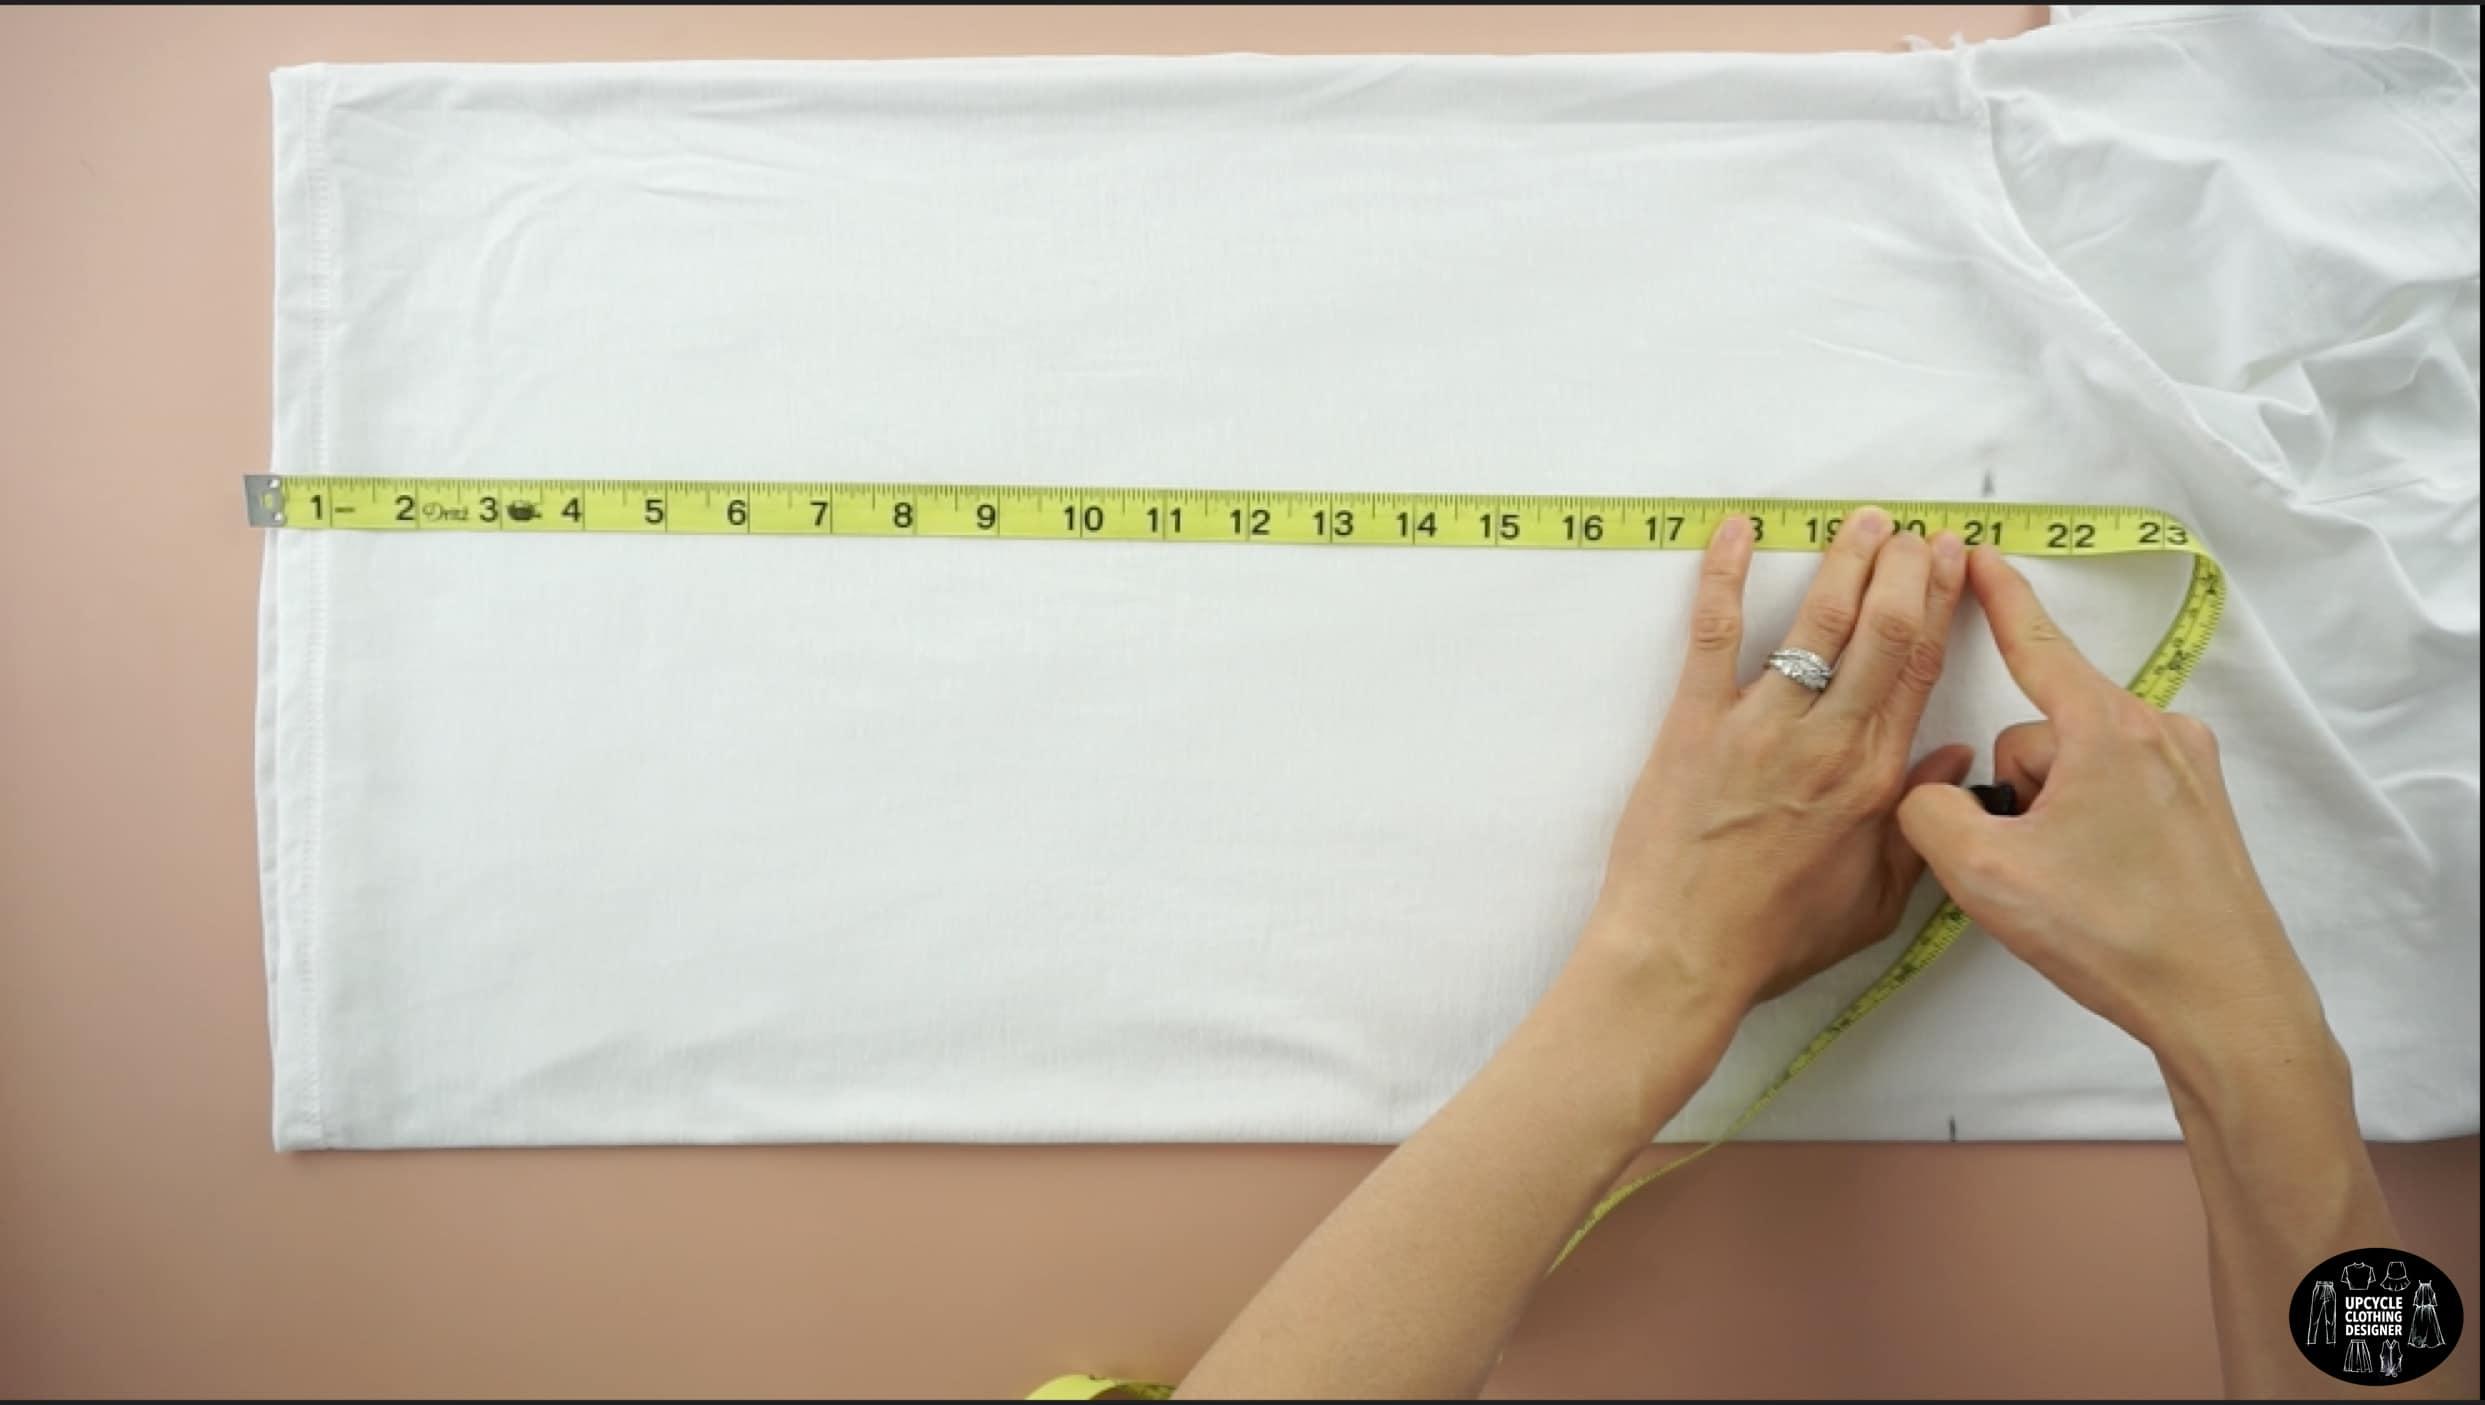 "Measure 21"" up from the bottom hemline"